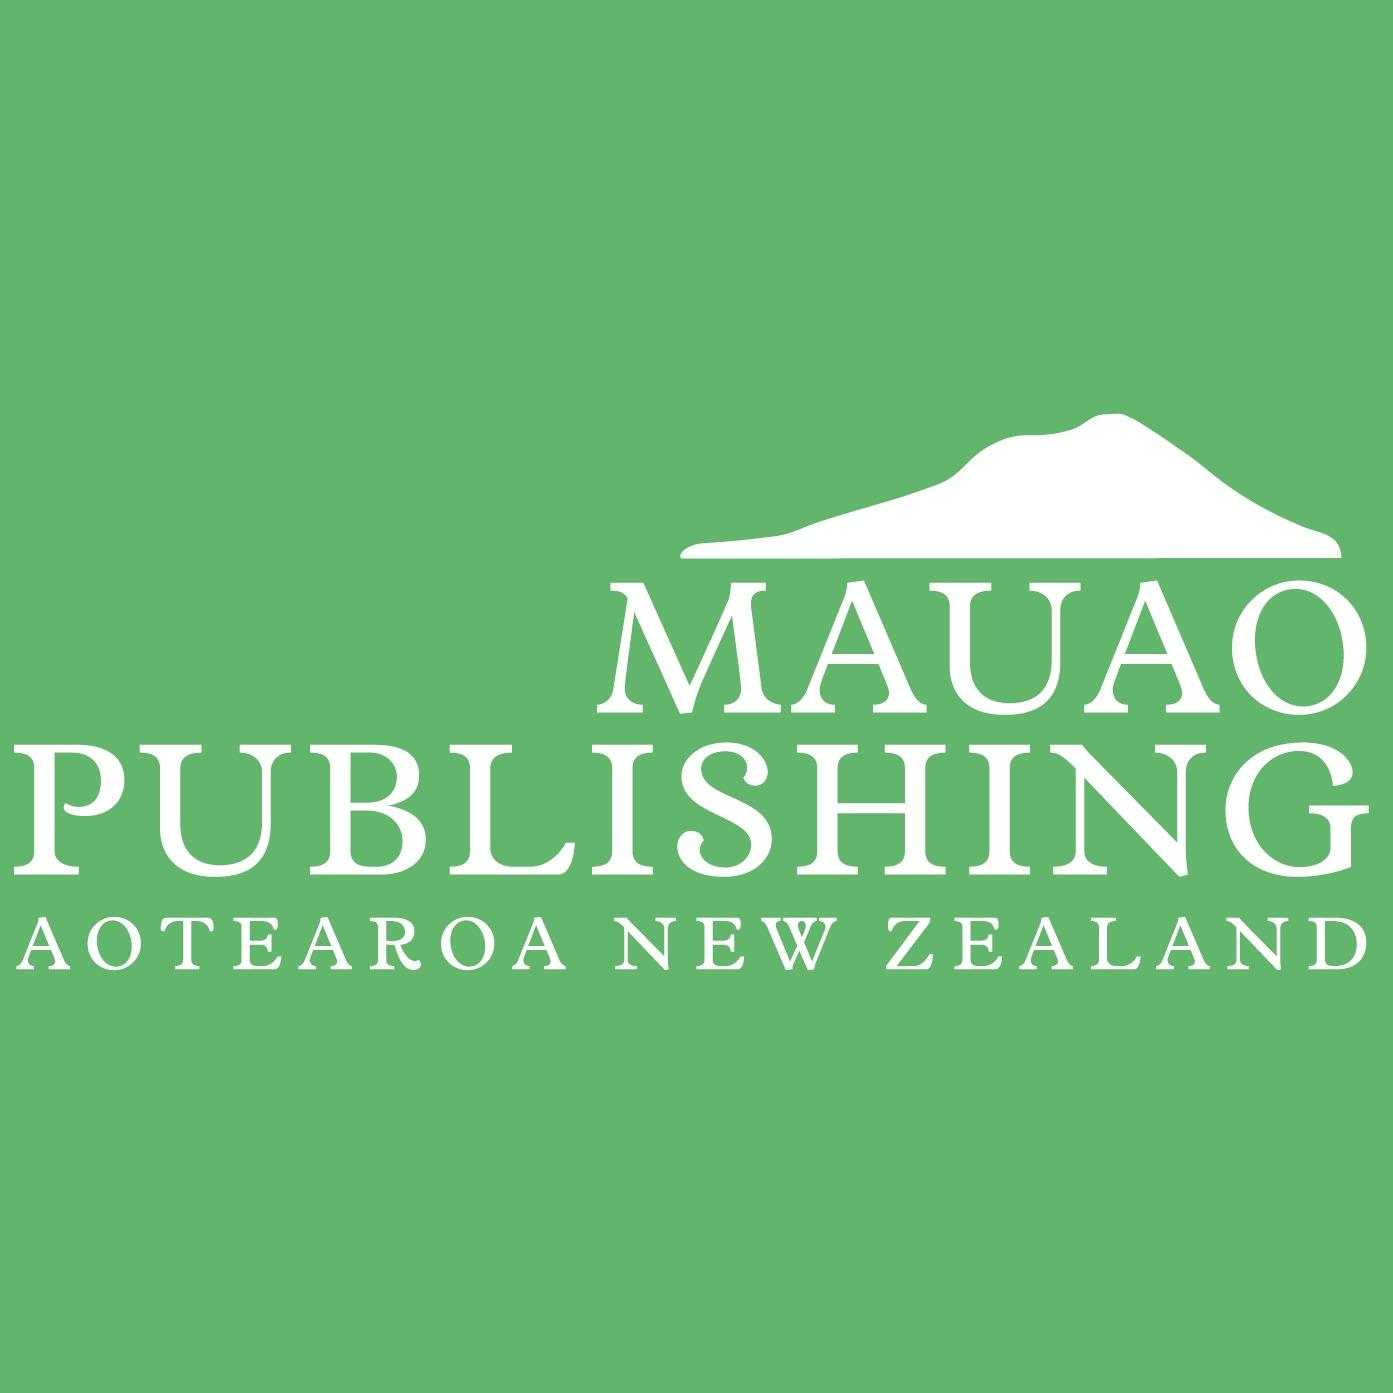 Mauao Publishing